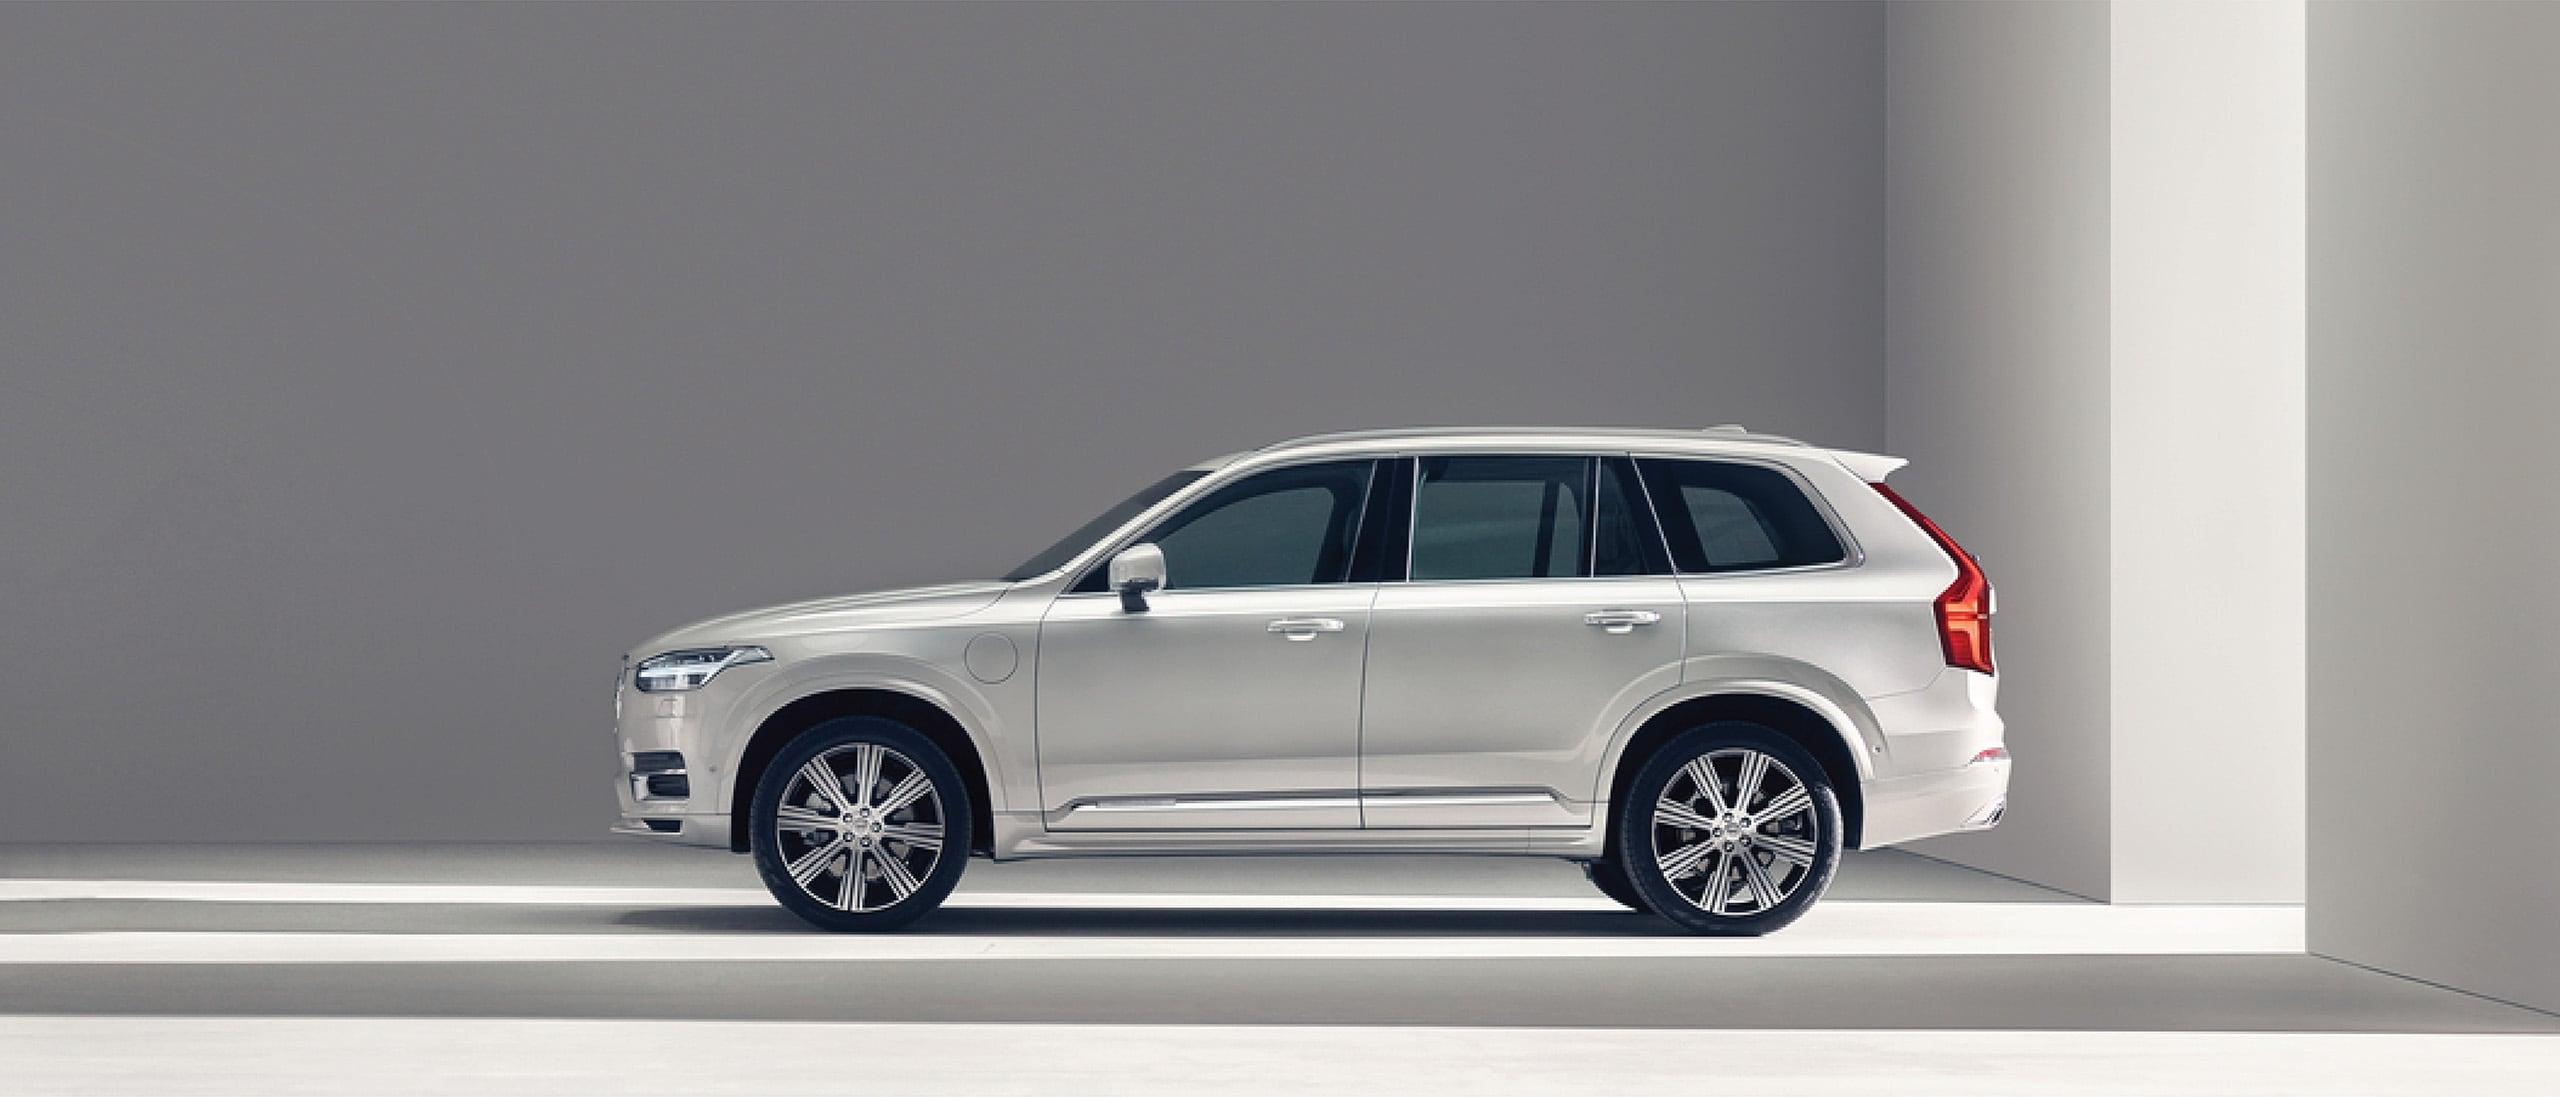 THE NEW VOLVO XC90. Drive the future.